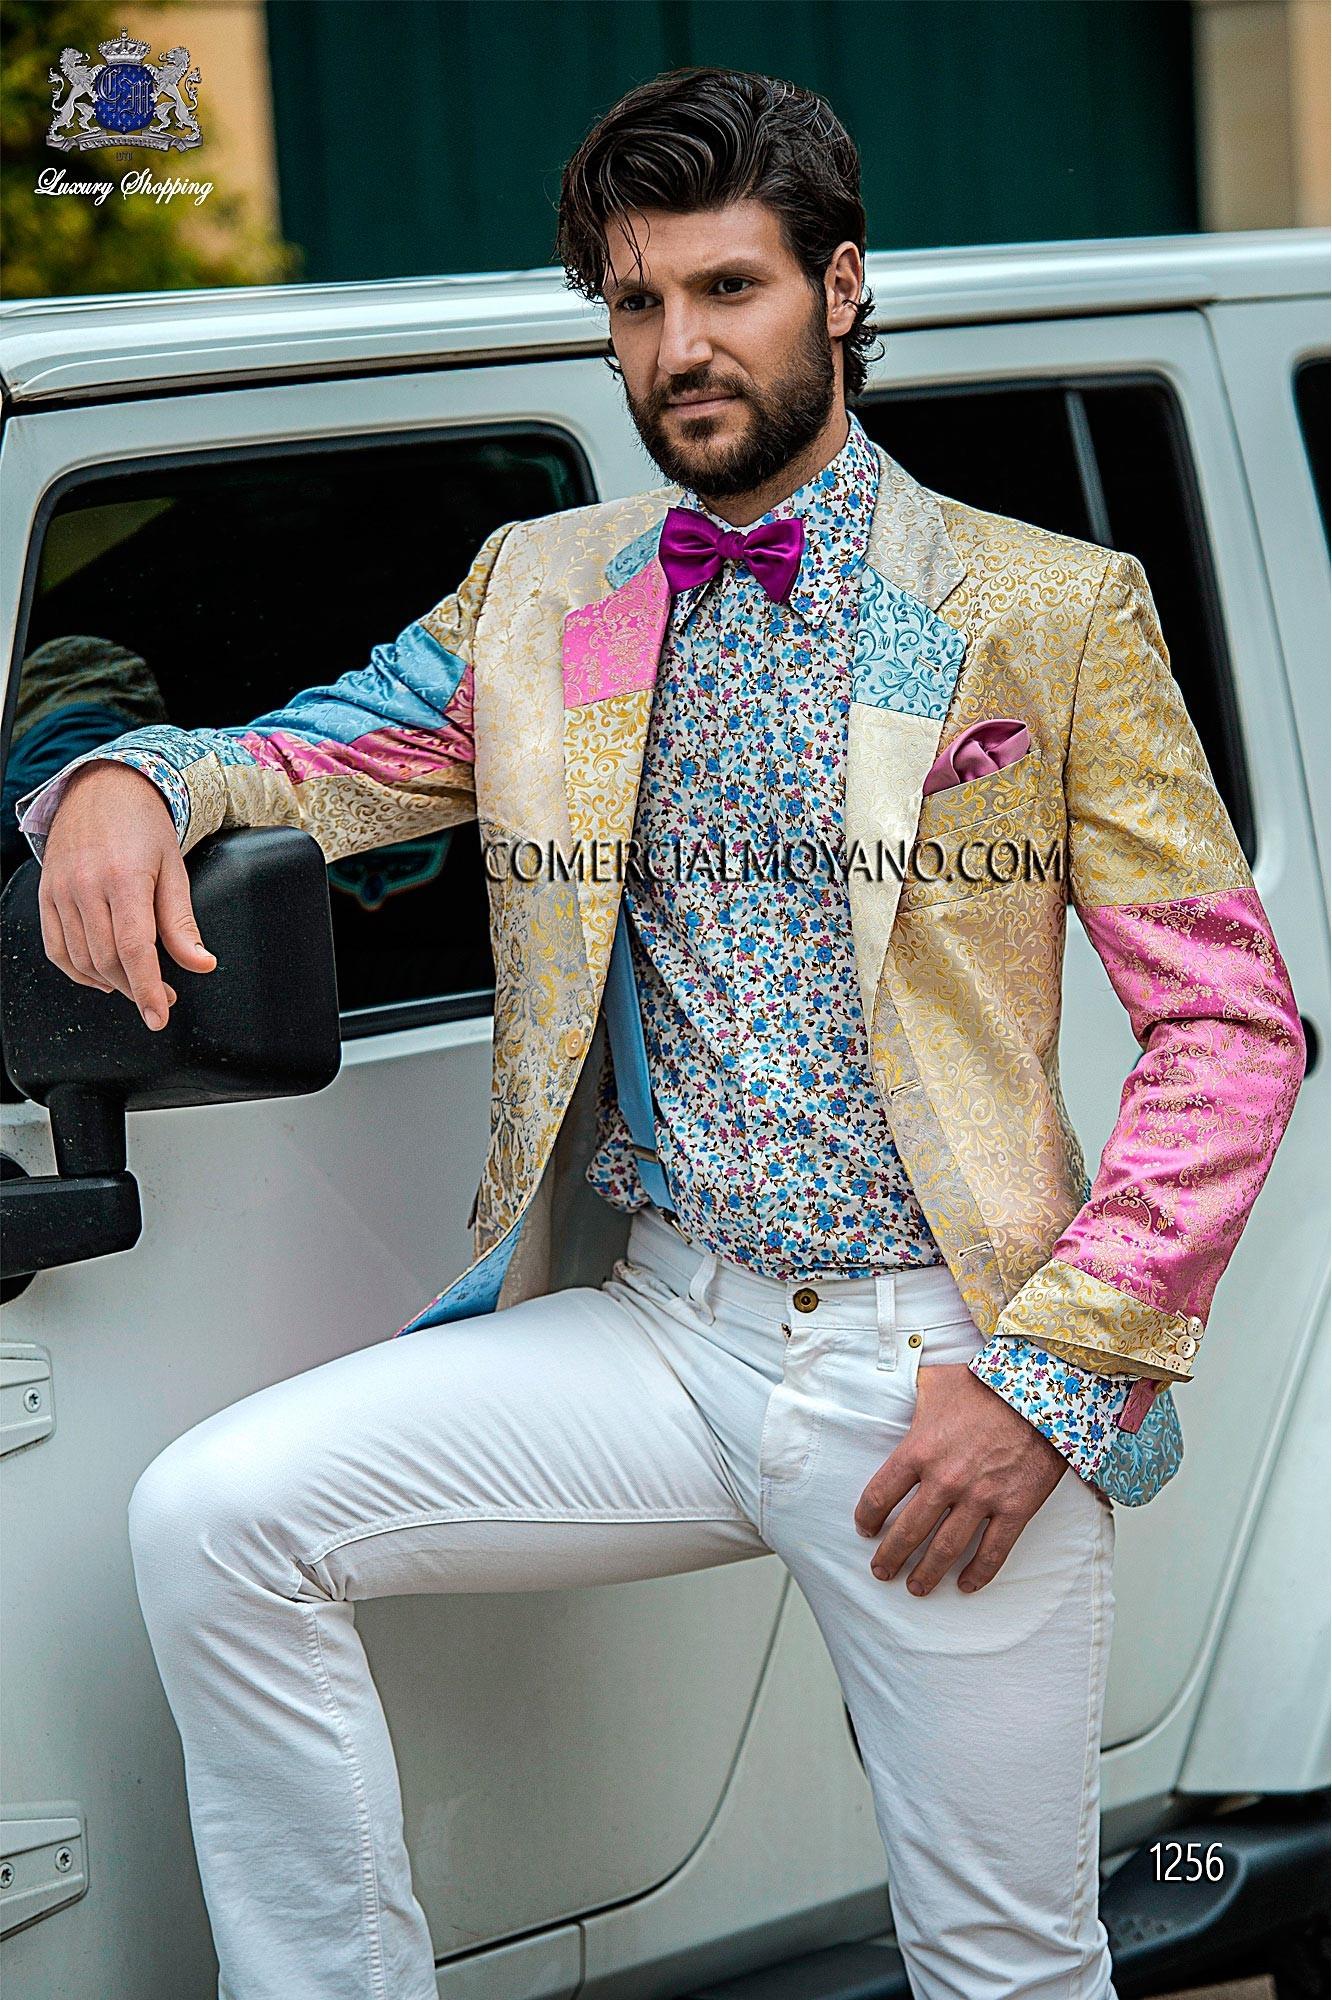 Hipster patchwork men wedding suit, model: 1256 Ottavio Nuccio Gala ...